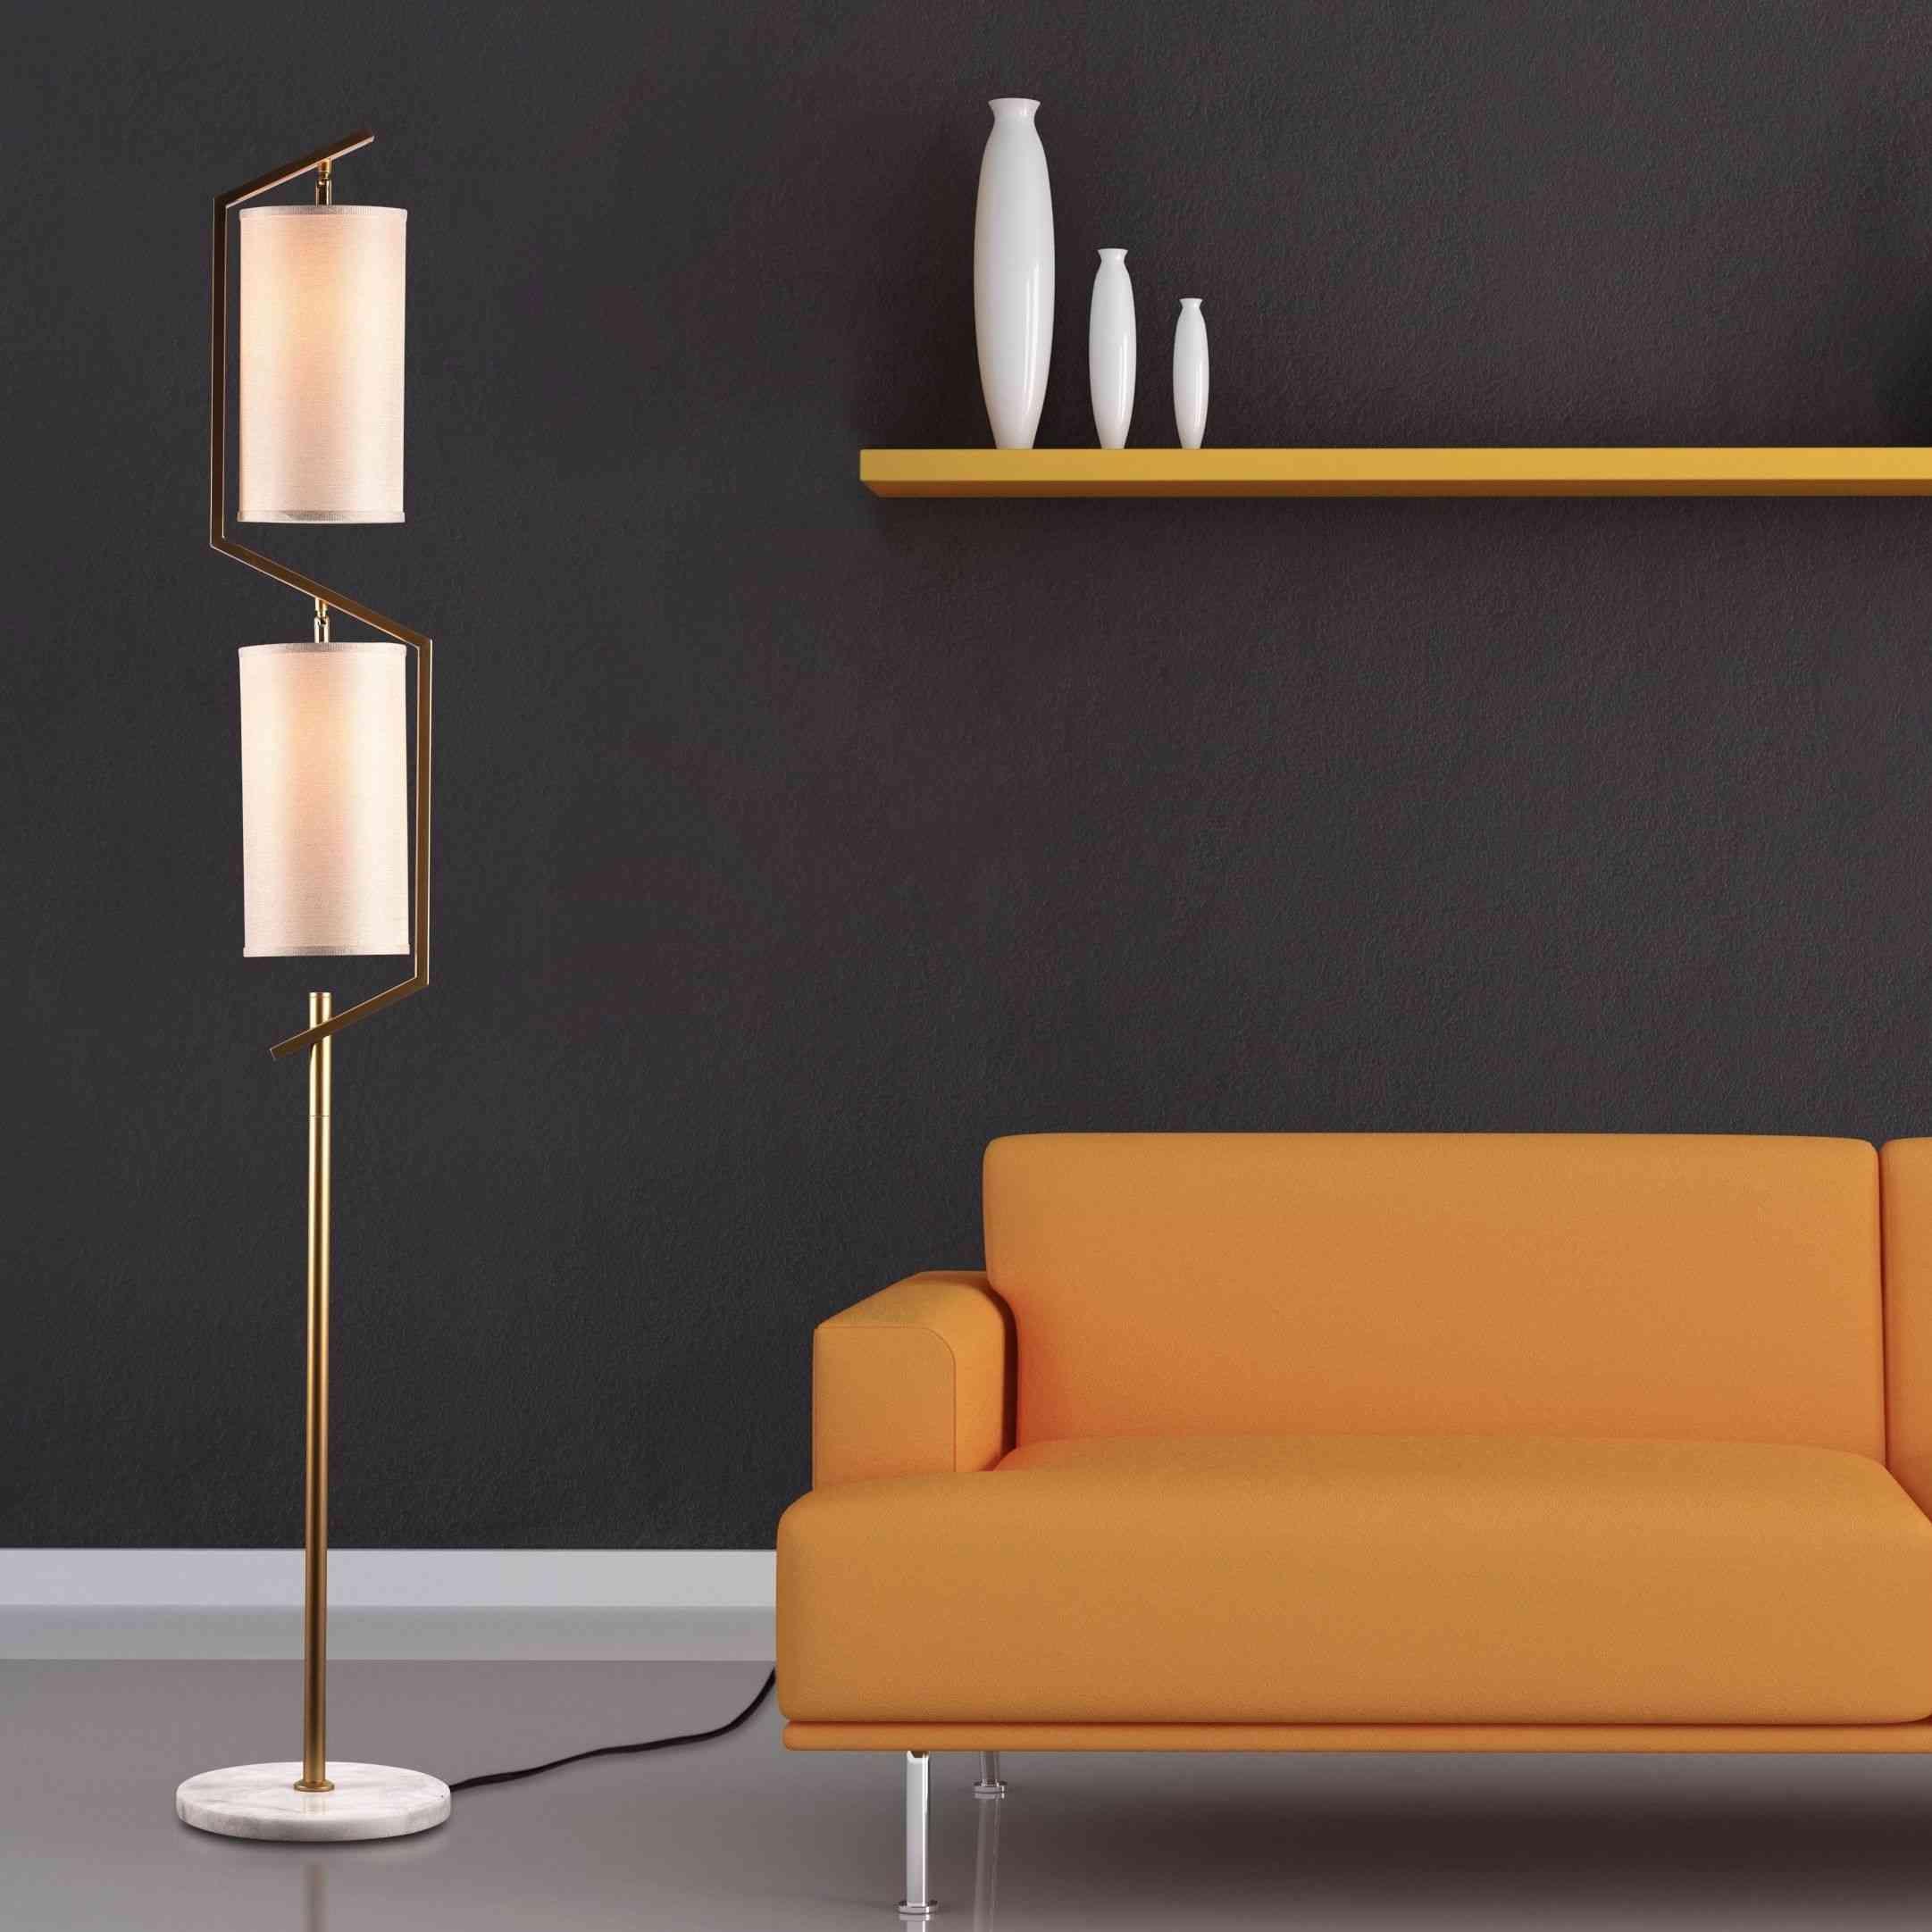 Effortless Floor Lamp Buy Premium Floor Lamps Online In India At A Great Price From India S Top Home Decorative Lighting Bran Floor Lamp Lamp Buying Flooring